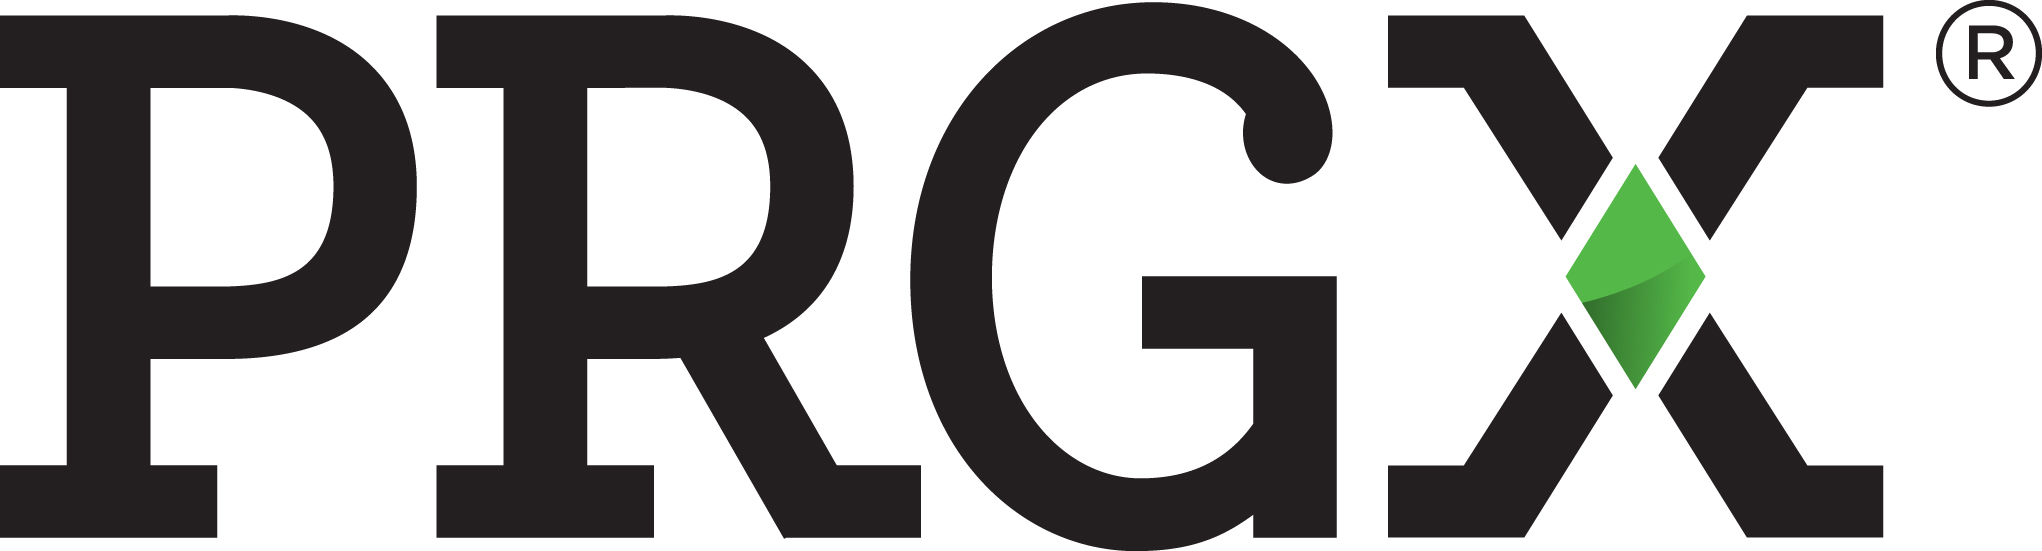 PRGX Global, Inc. Announces First Quarter 2015 Financial Results